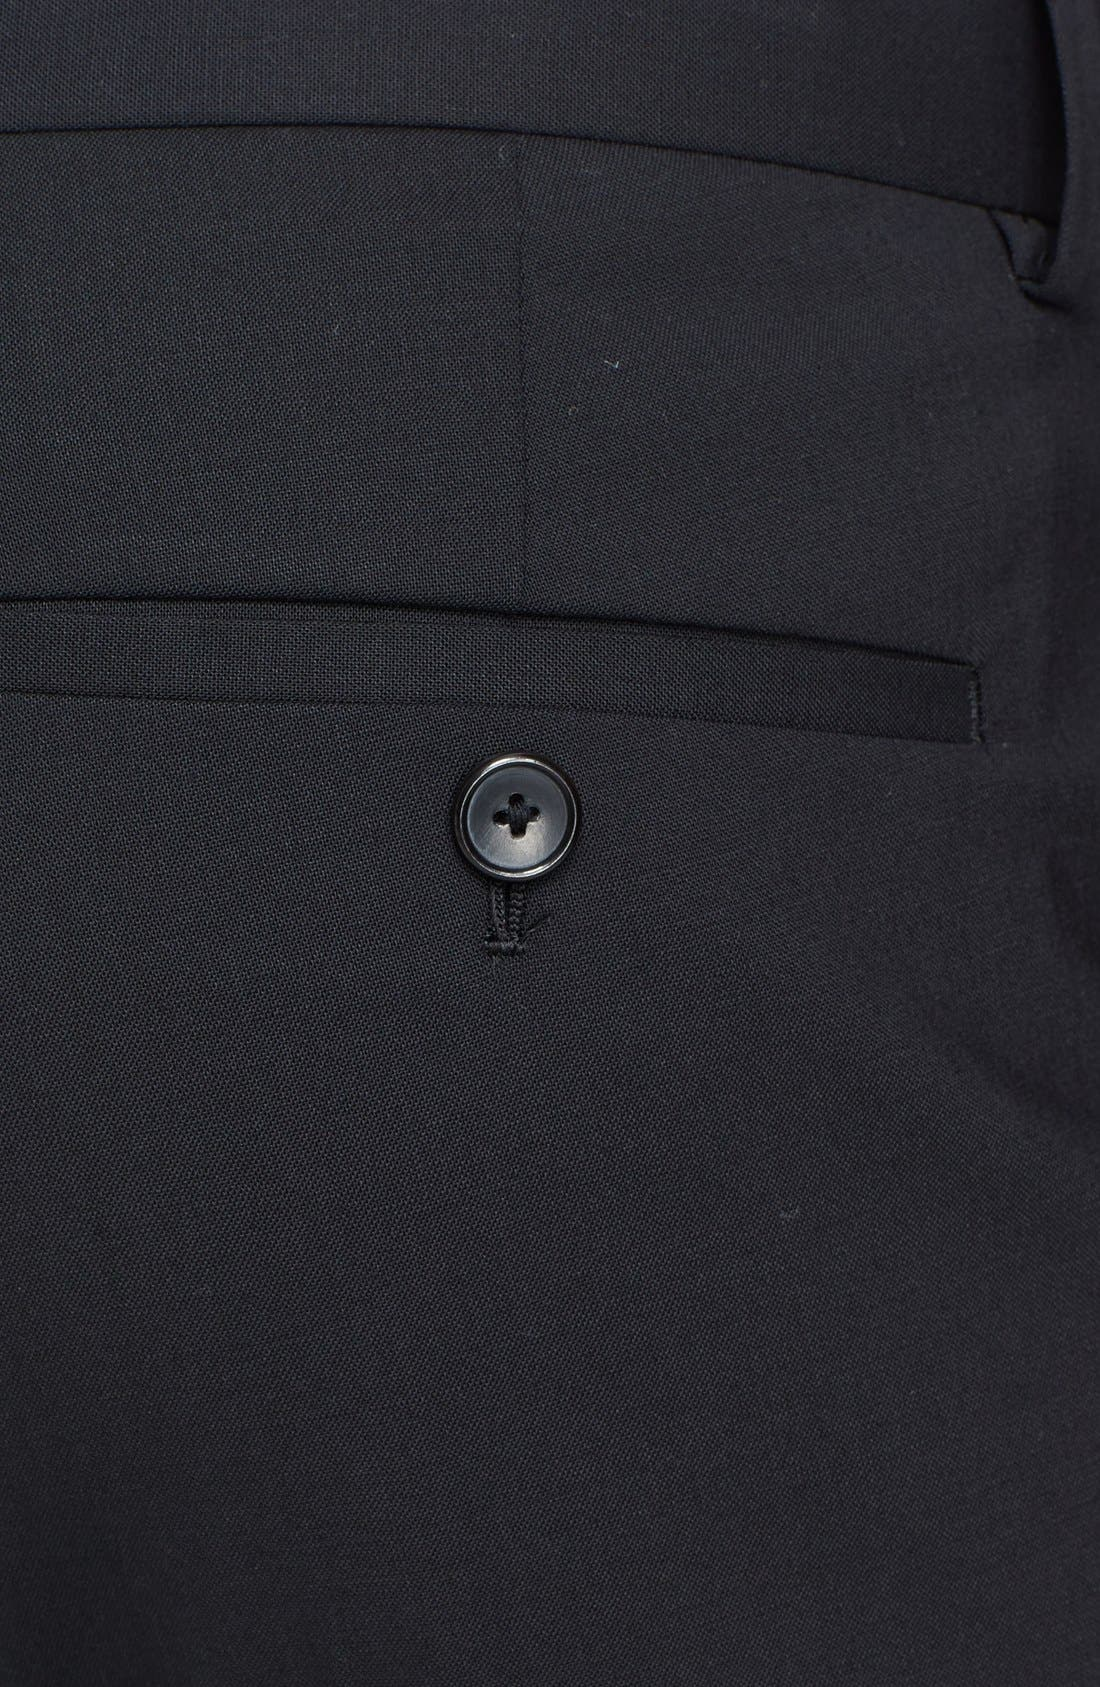 'Marlo New Tailor' Slim Fit Pants,                             Alternate thumbnail 14, color,